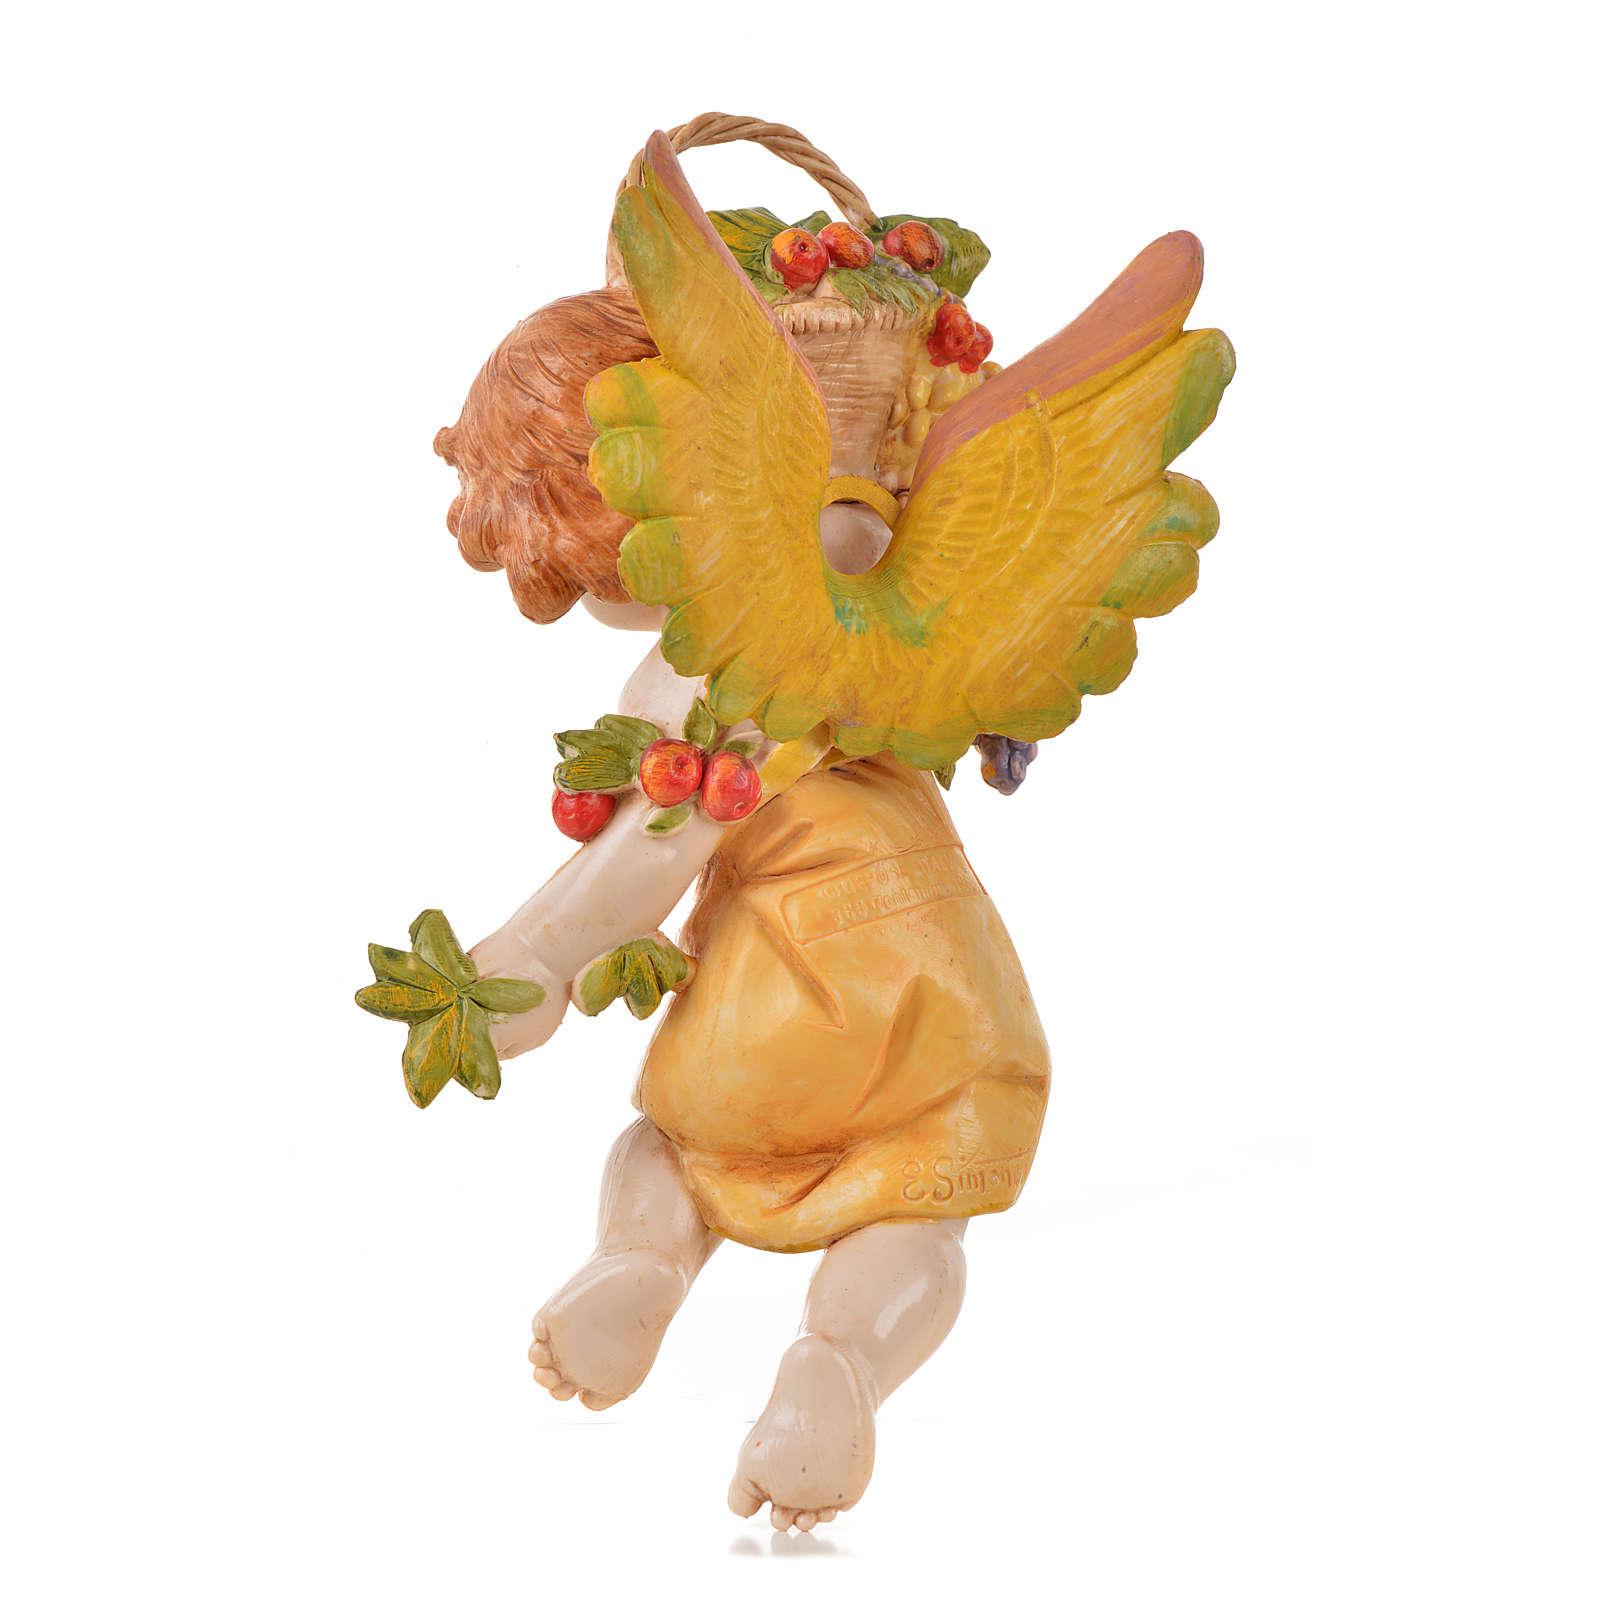 Ángel del otoño con uva Fontanini cm. 17 símil porcelana 3